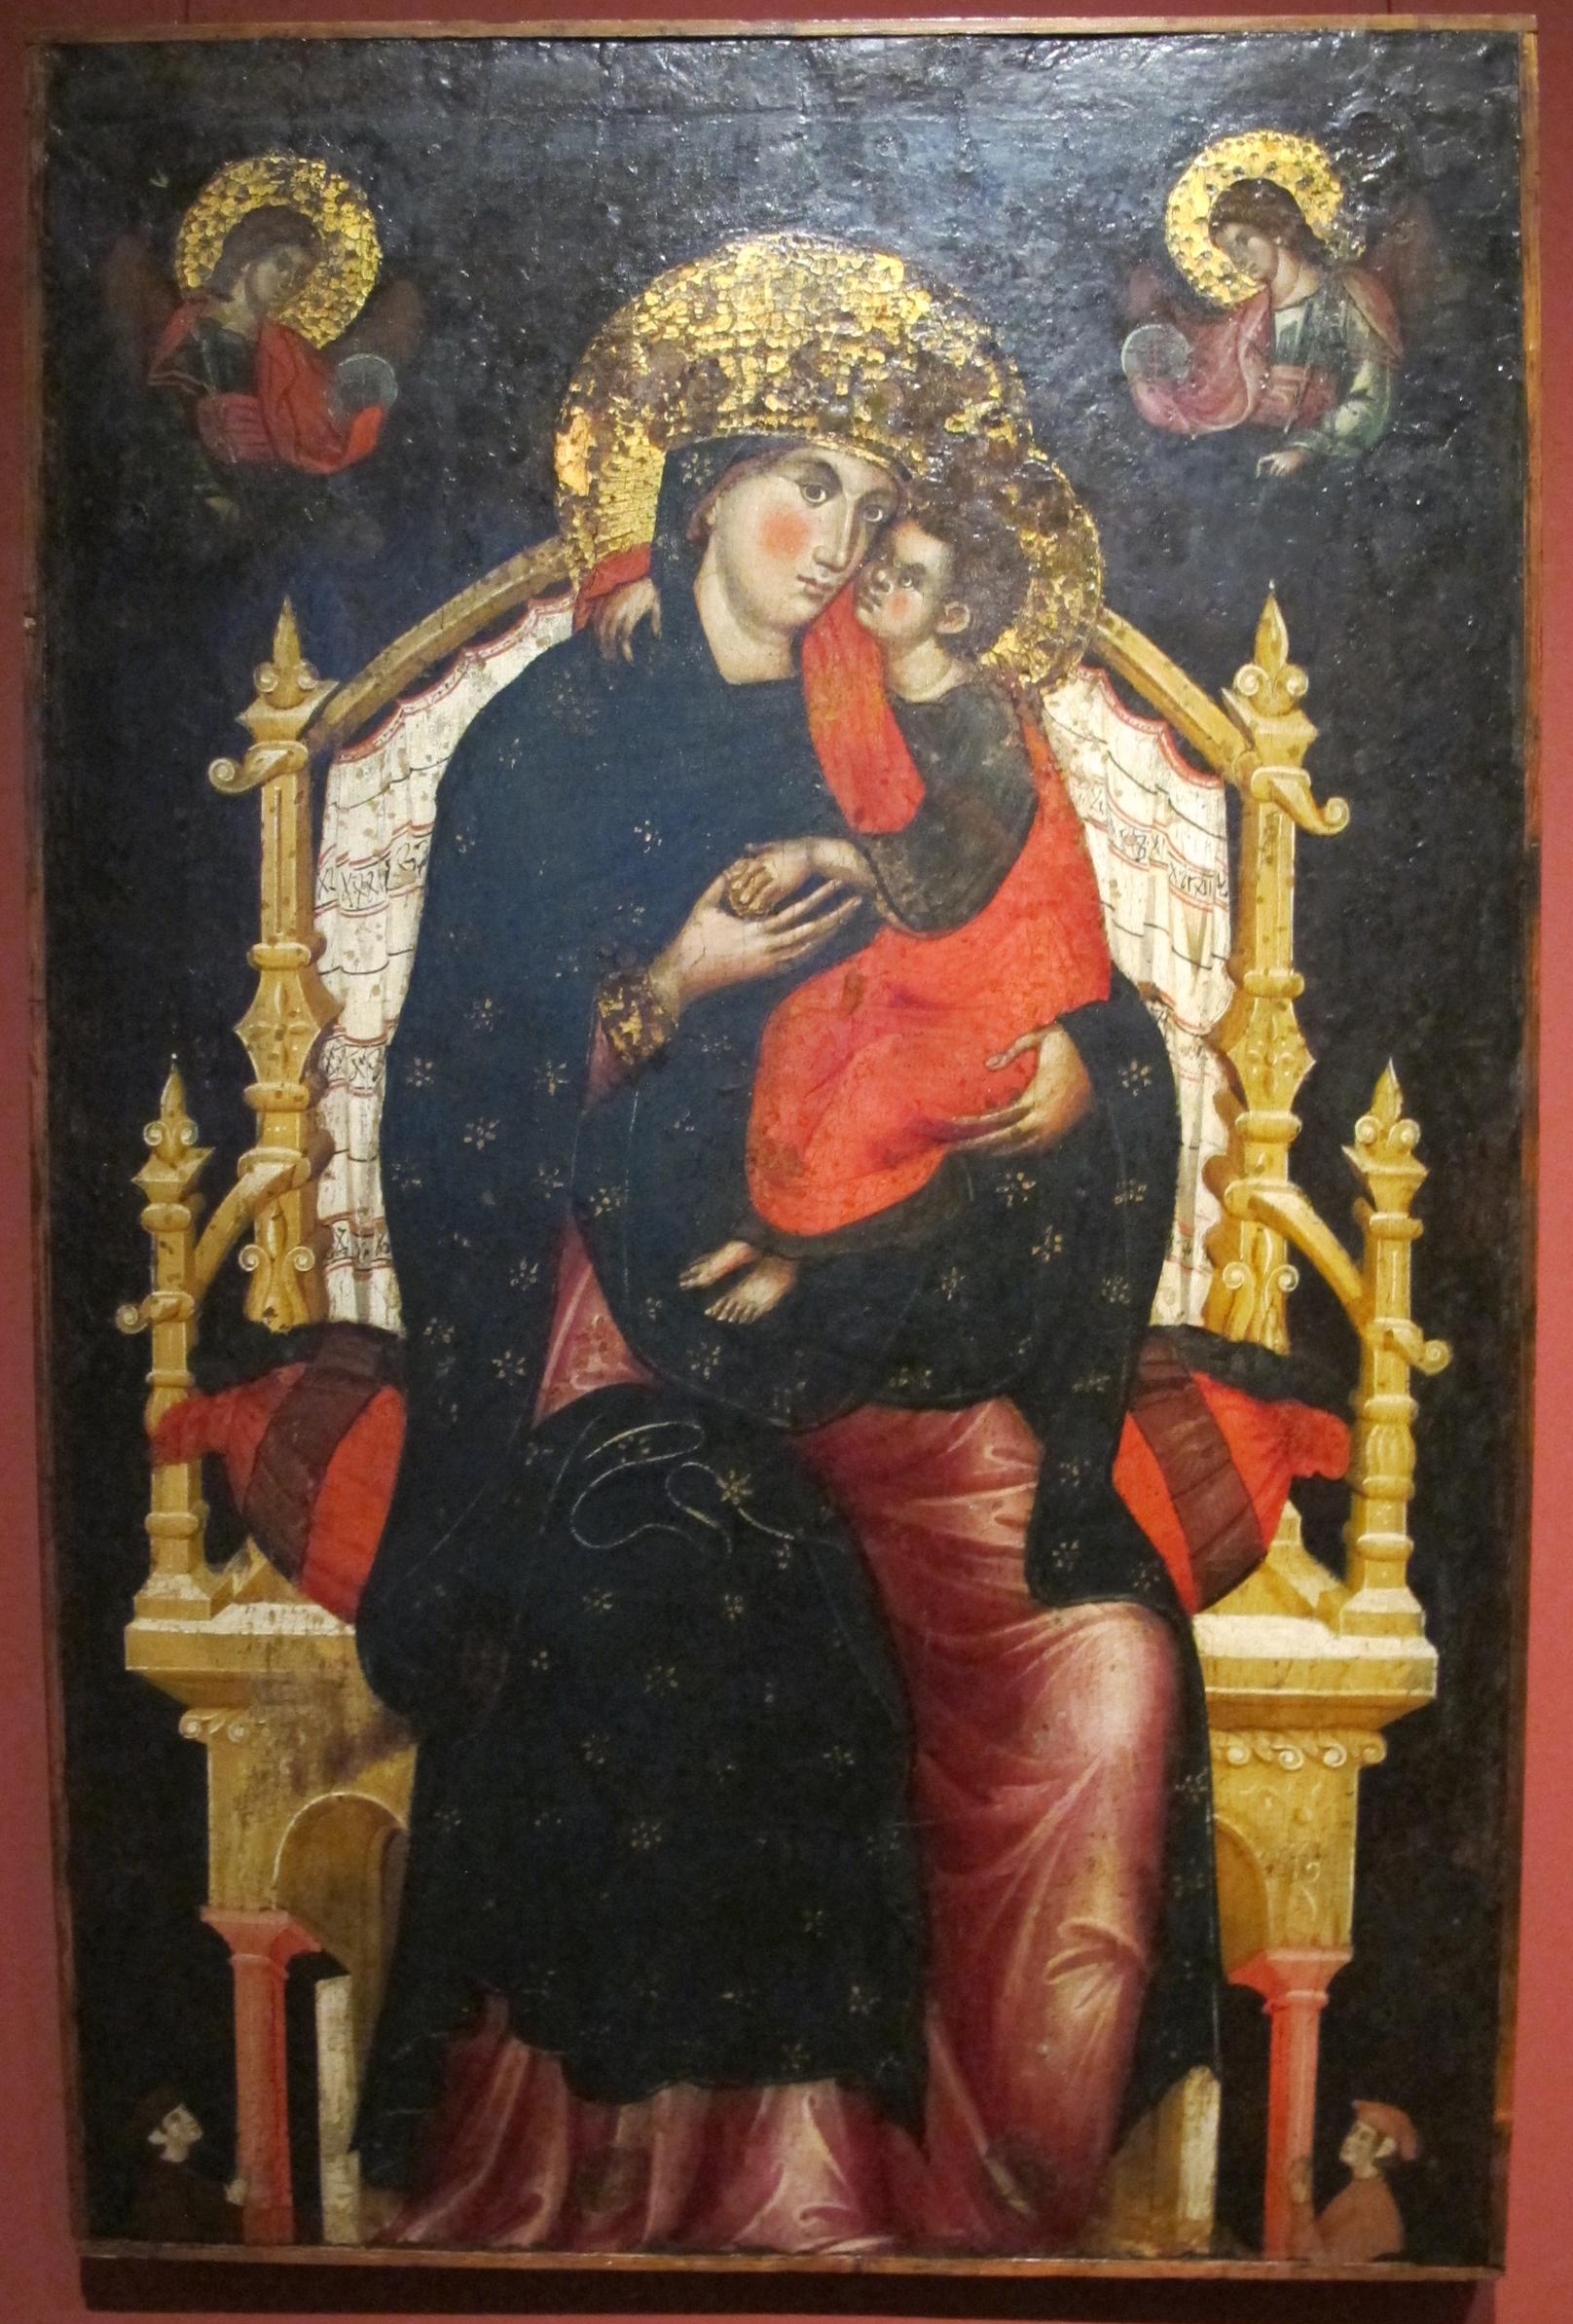 1310-15 MARCO DI MARTINO DA VENEZIA Vierge glykophilousa and Child Enthroned with Donors Pushkin Museum